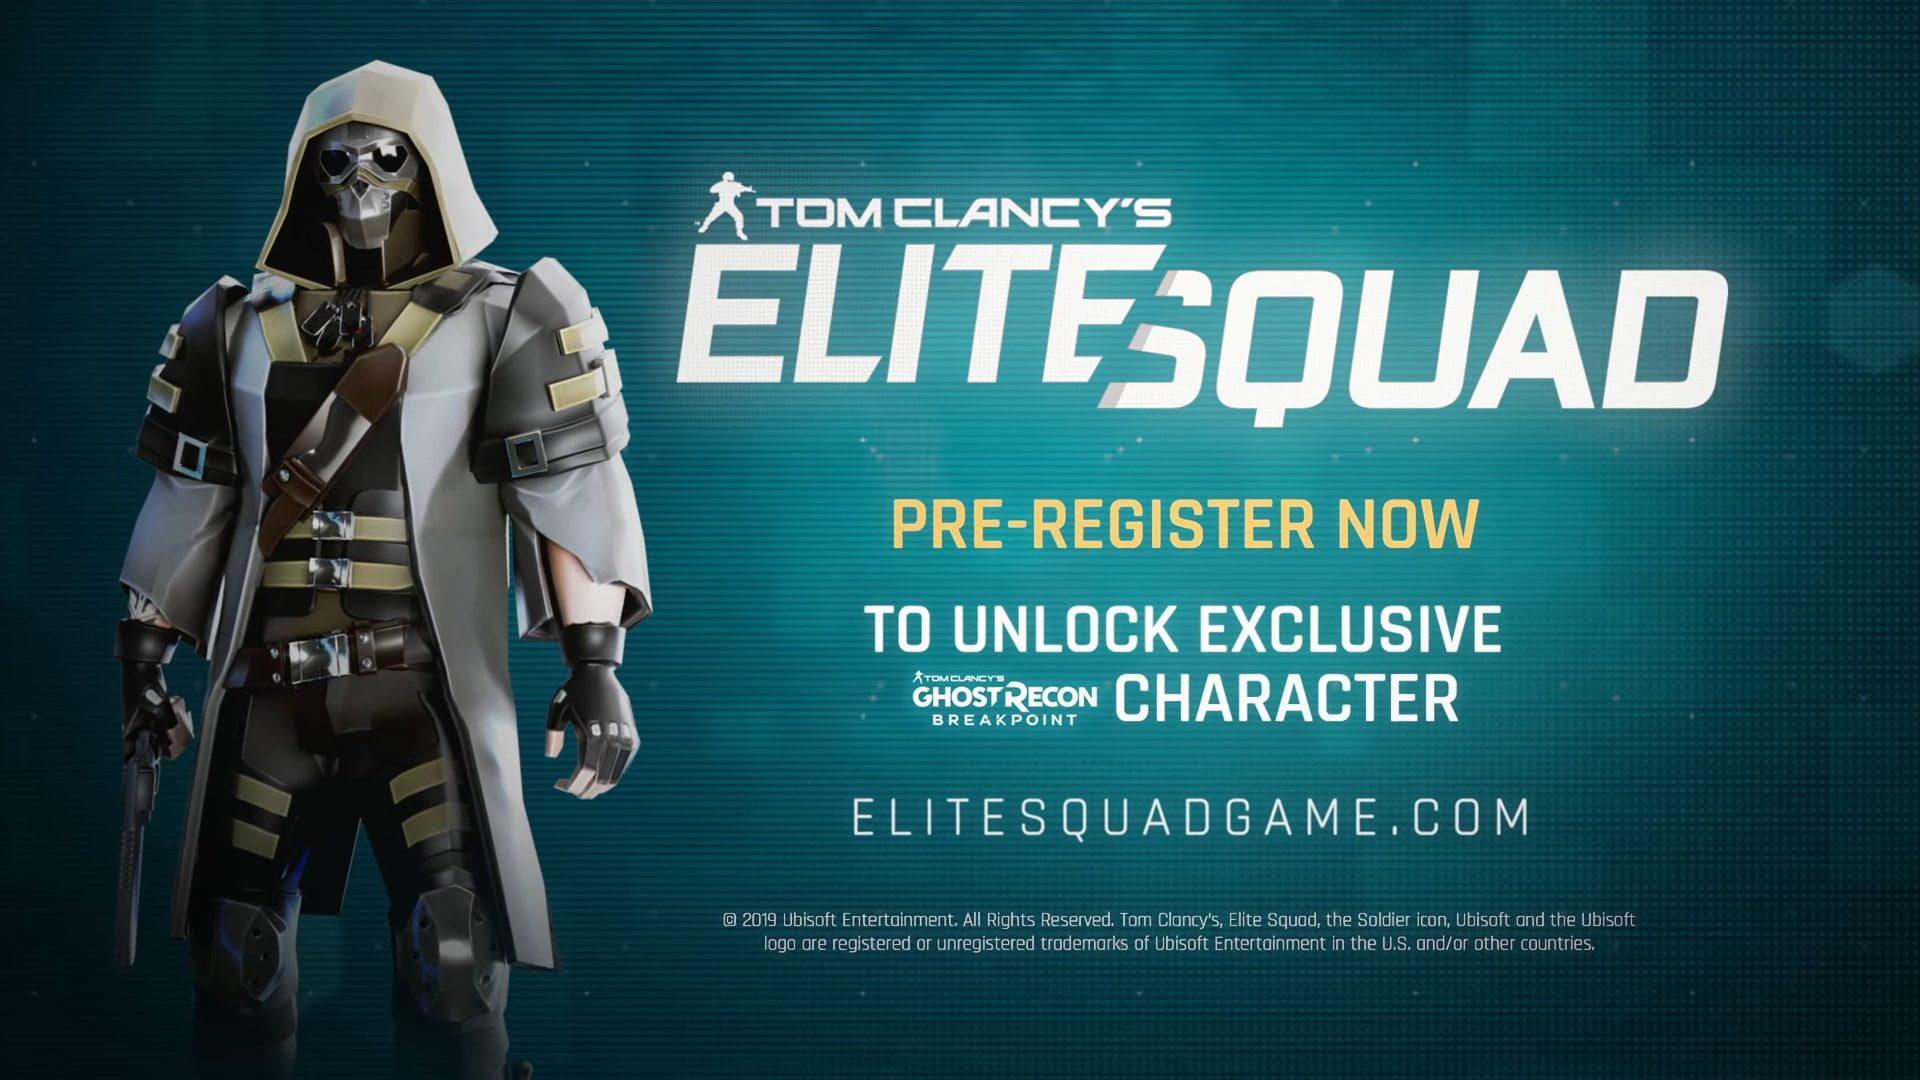 E3 @ 2019 - Ubisoft Announces Tom Clancy's Elite Squad ...